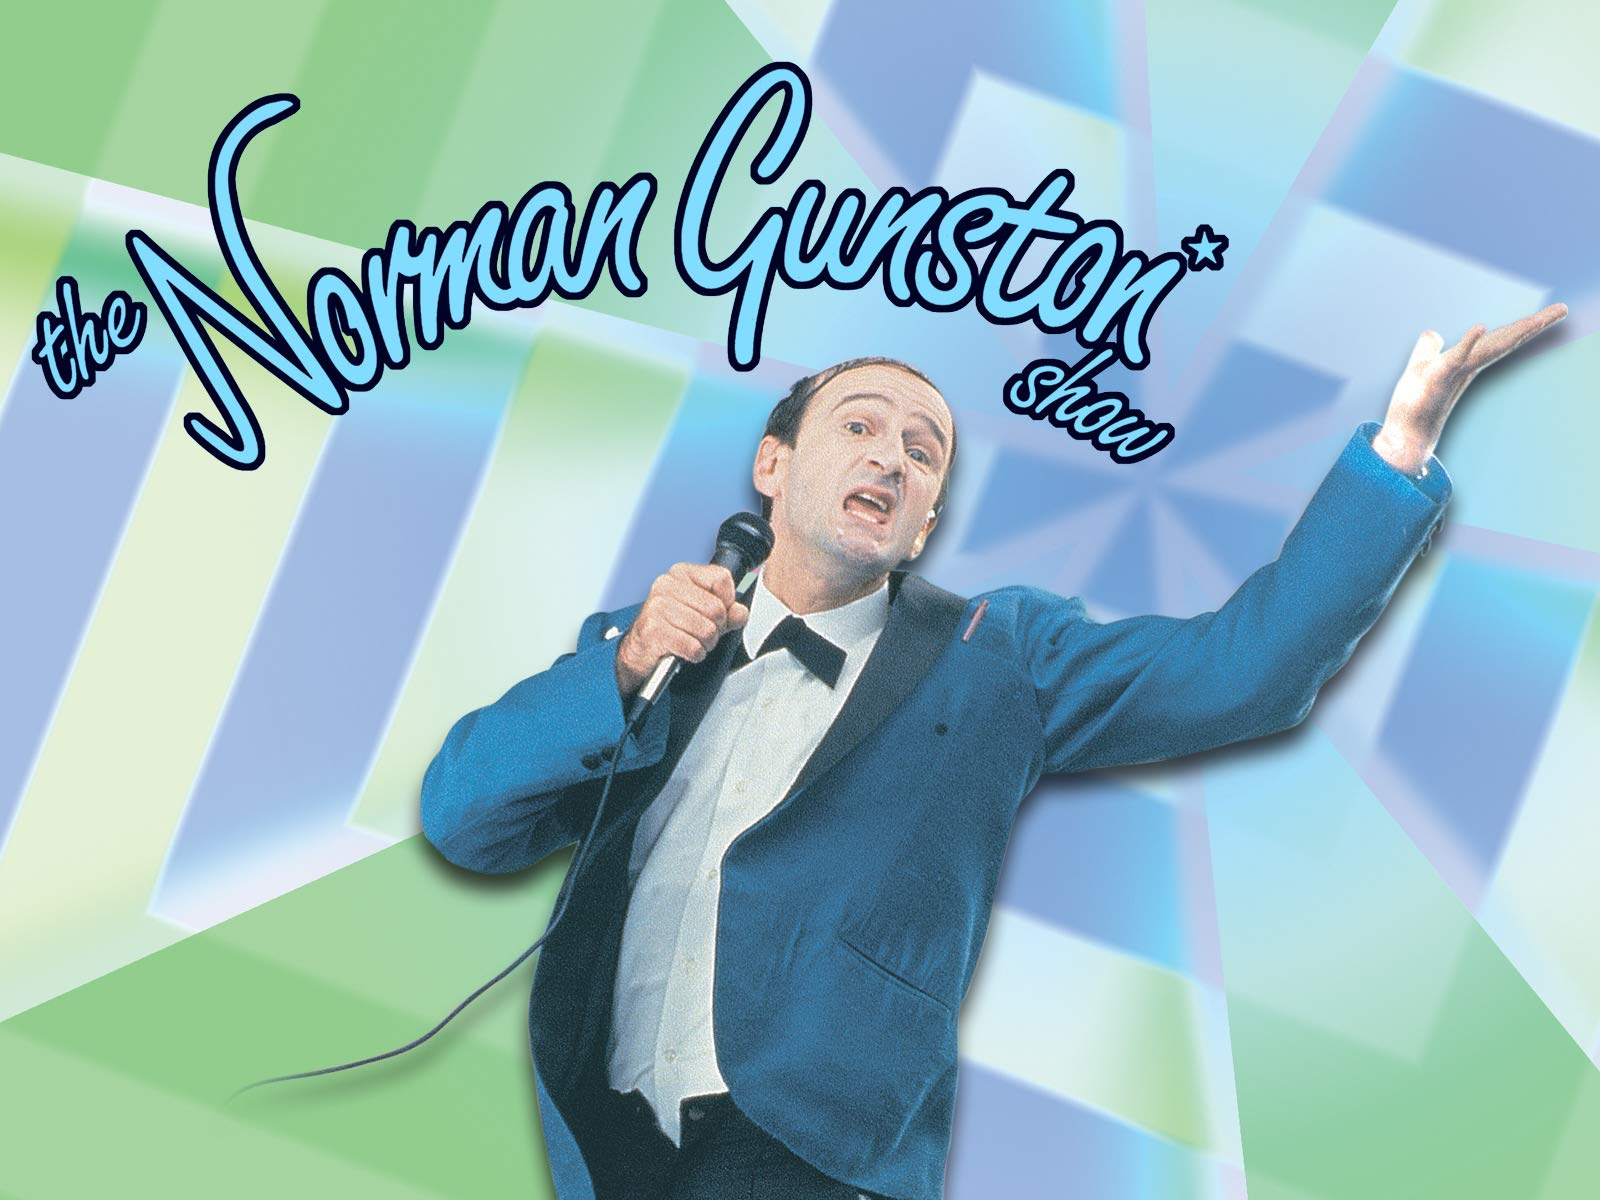 Norman Gunston Collection